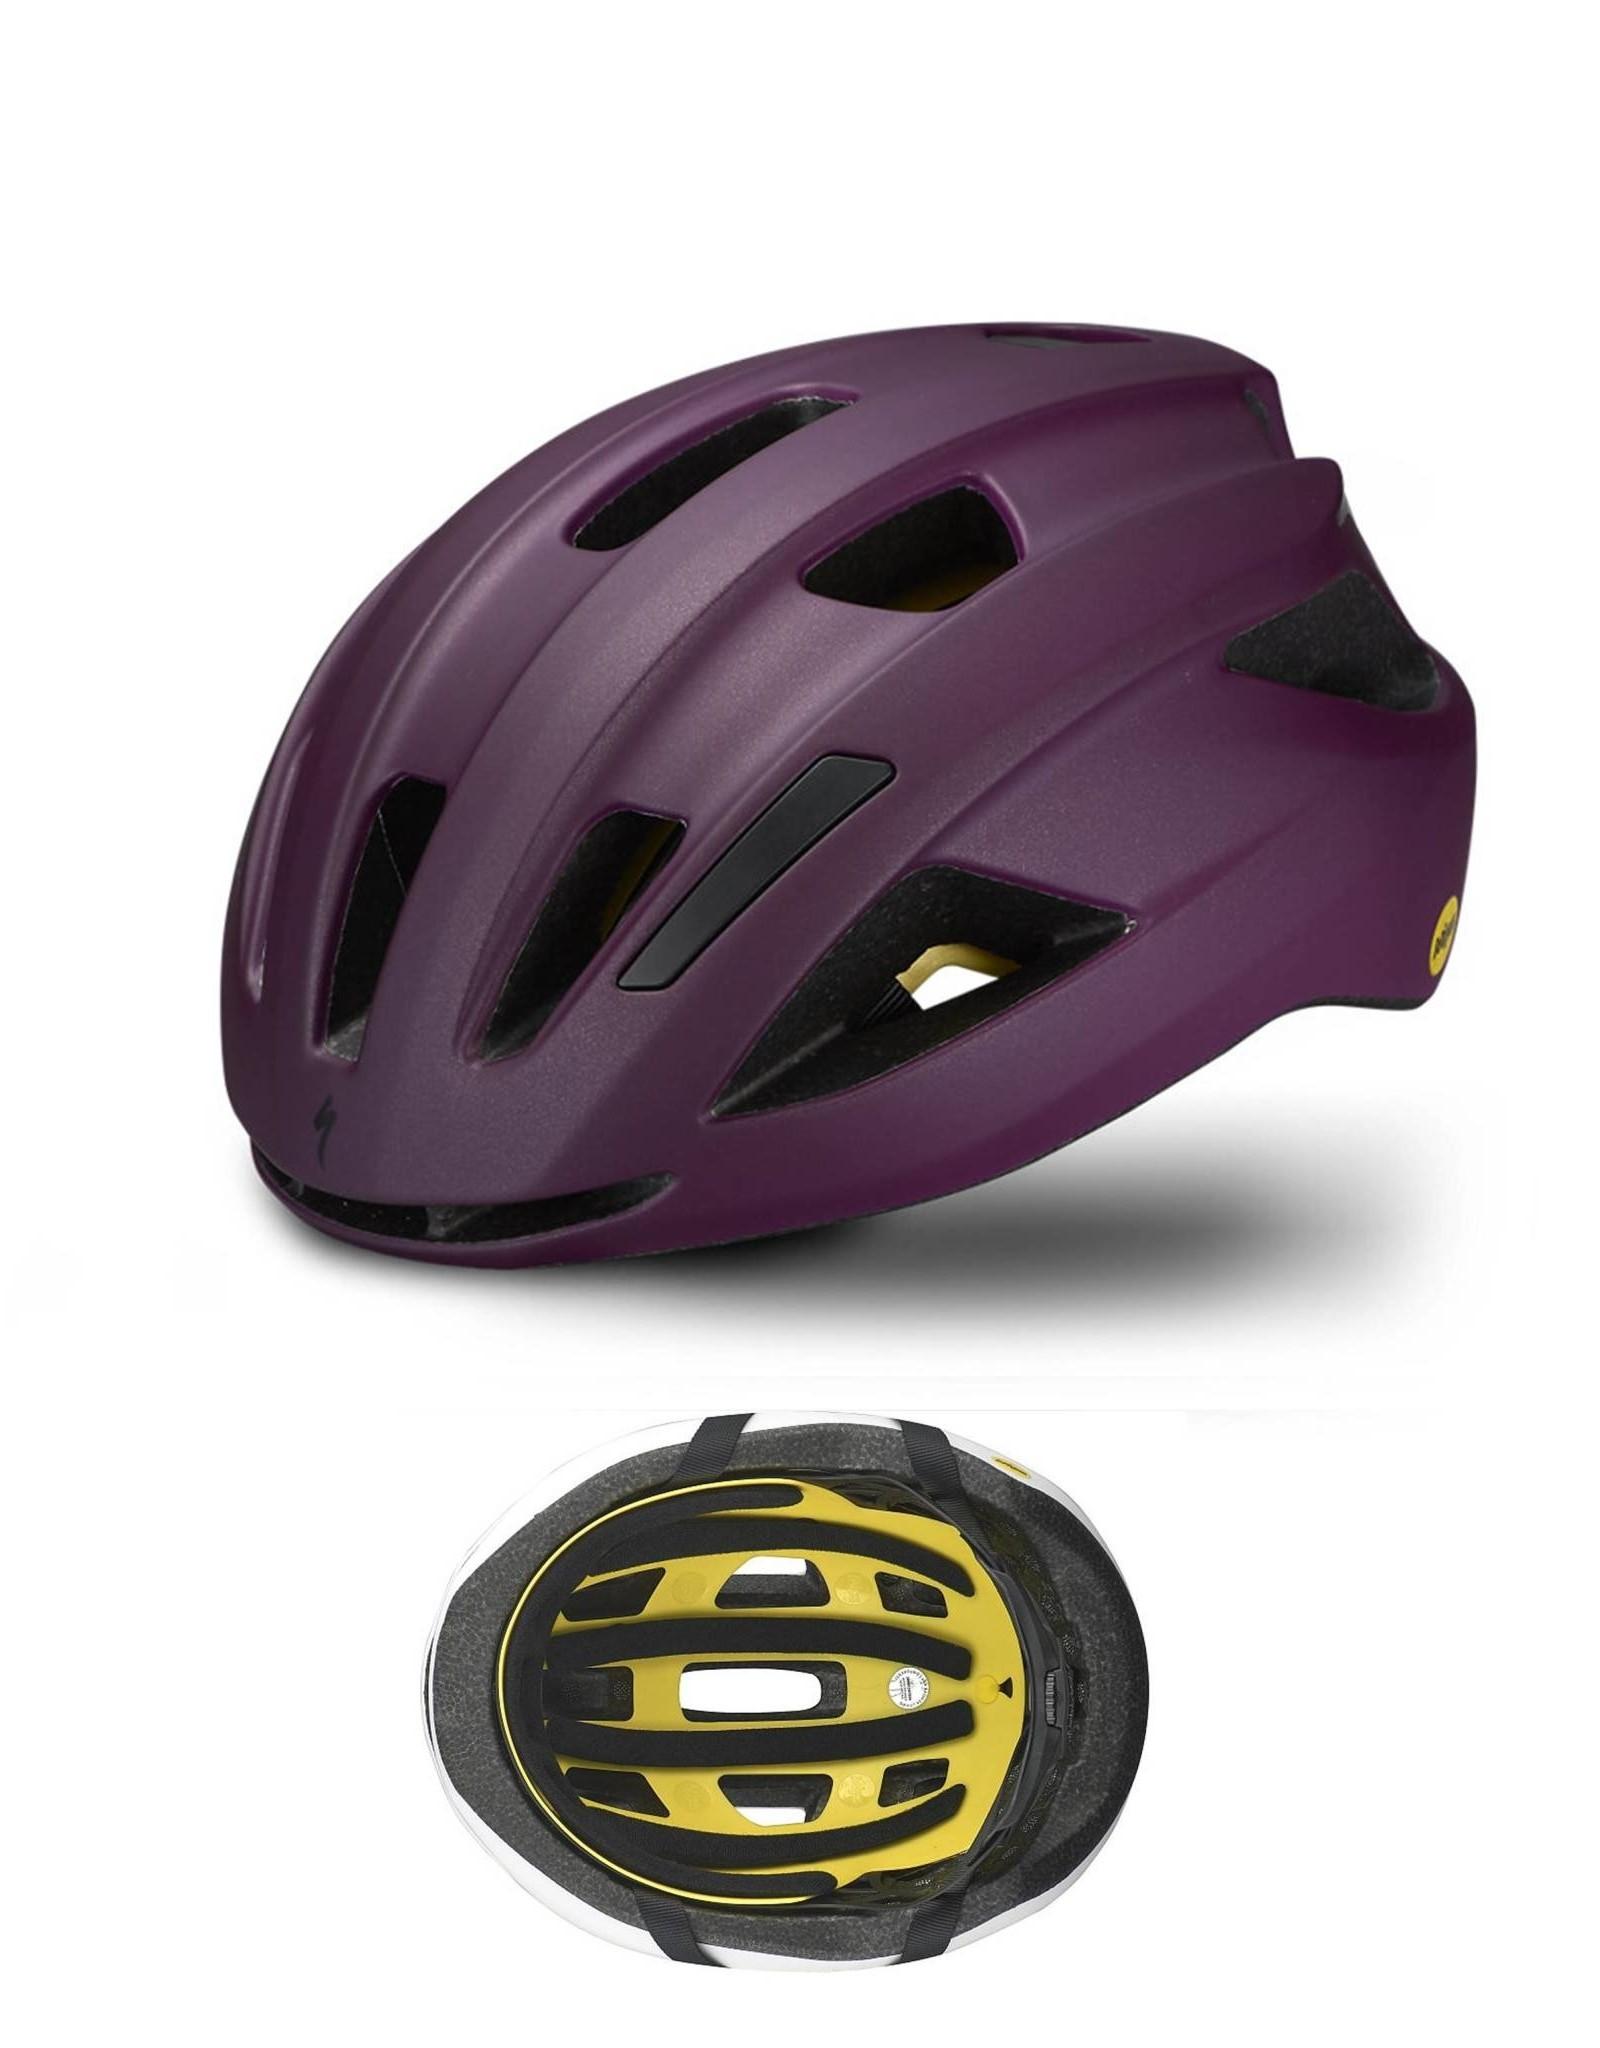 SPECIALIZED Specialized Align MIPS II Helmet Satin Cast Berry